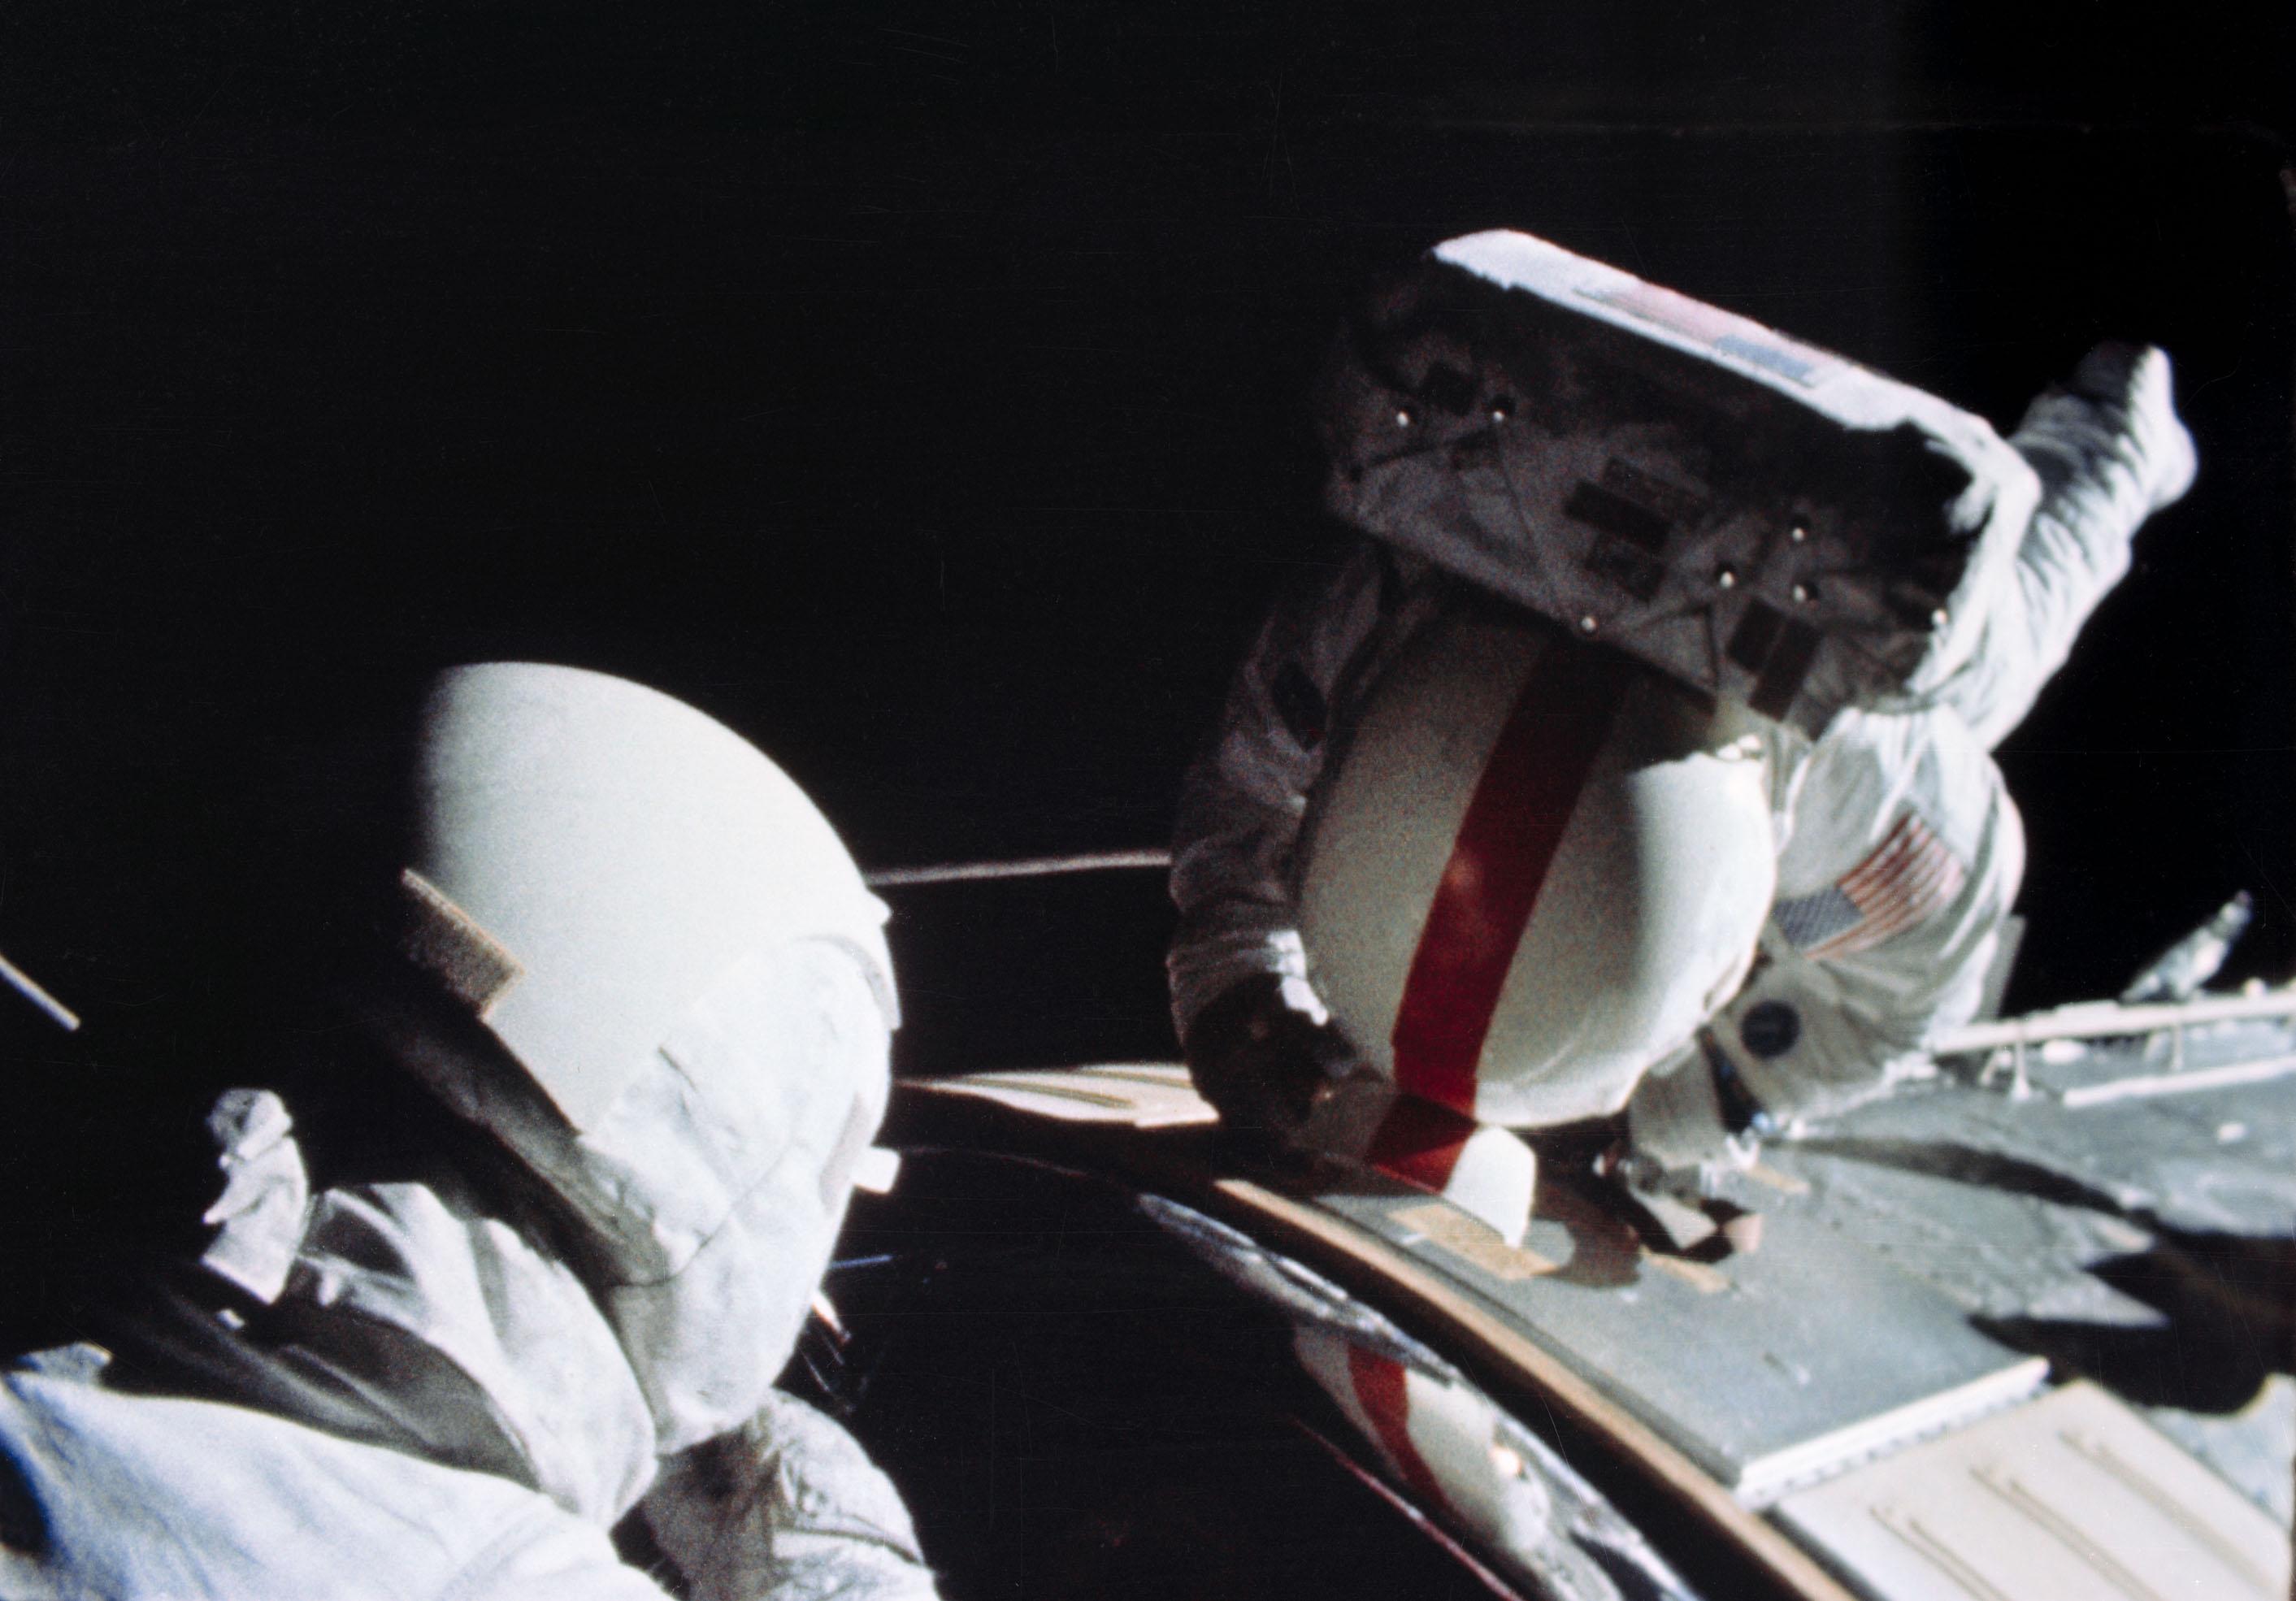 NASA - Apollo Astronaut Mattingly Lauded for Service